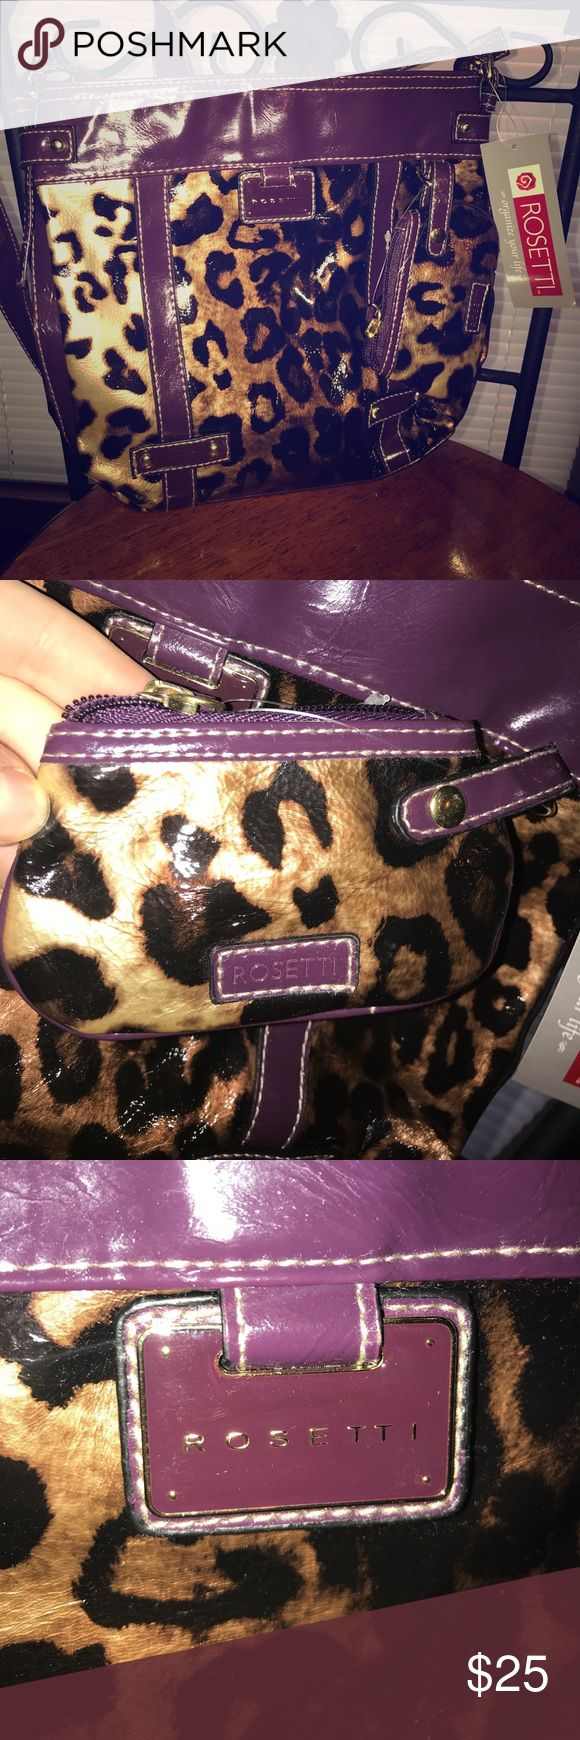 Rosetti cheetah print handbag . New with tags New with tags. Rosetti Cheetah print over the shoulder purse Fratelli Rossetti Bags Shoulder Bags